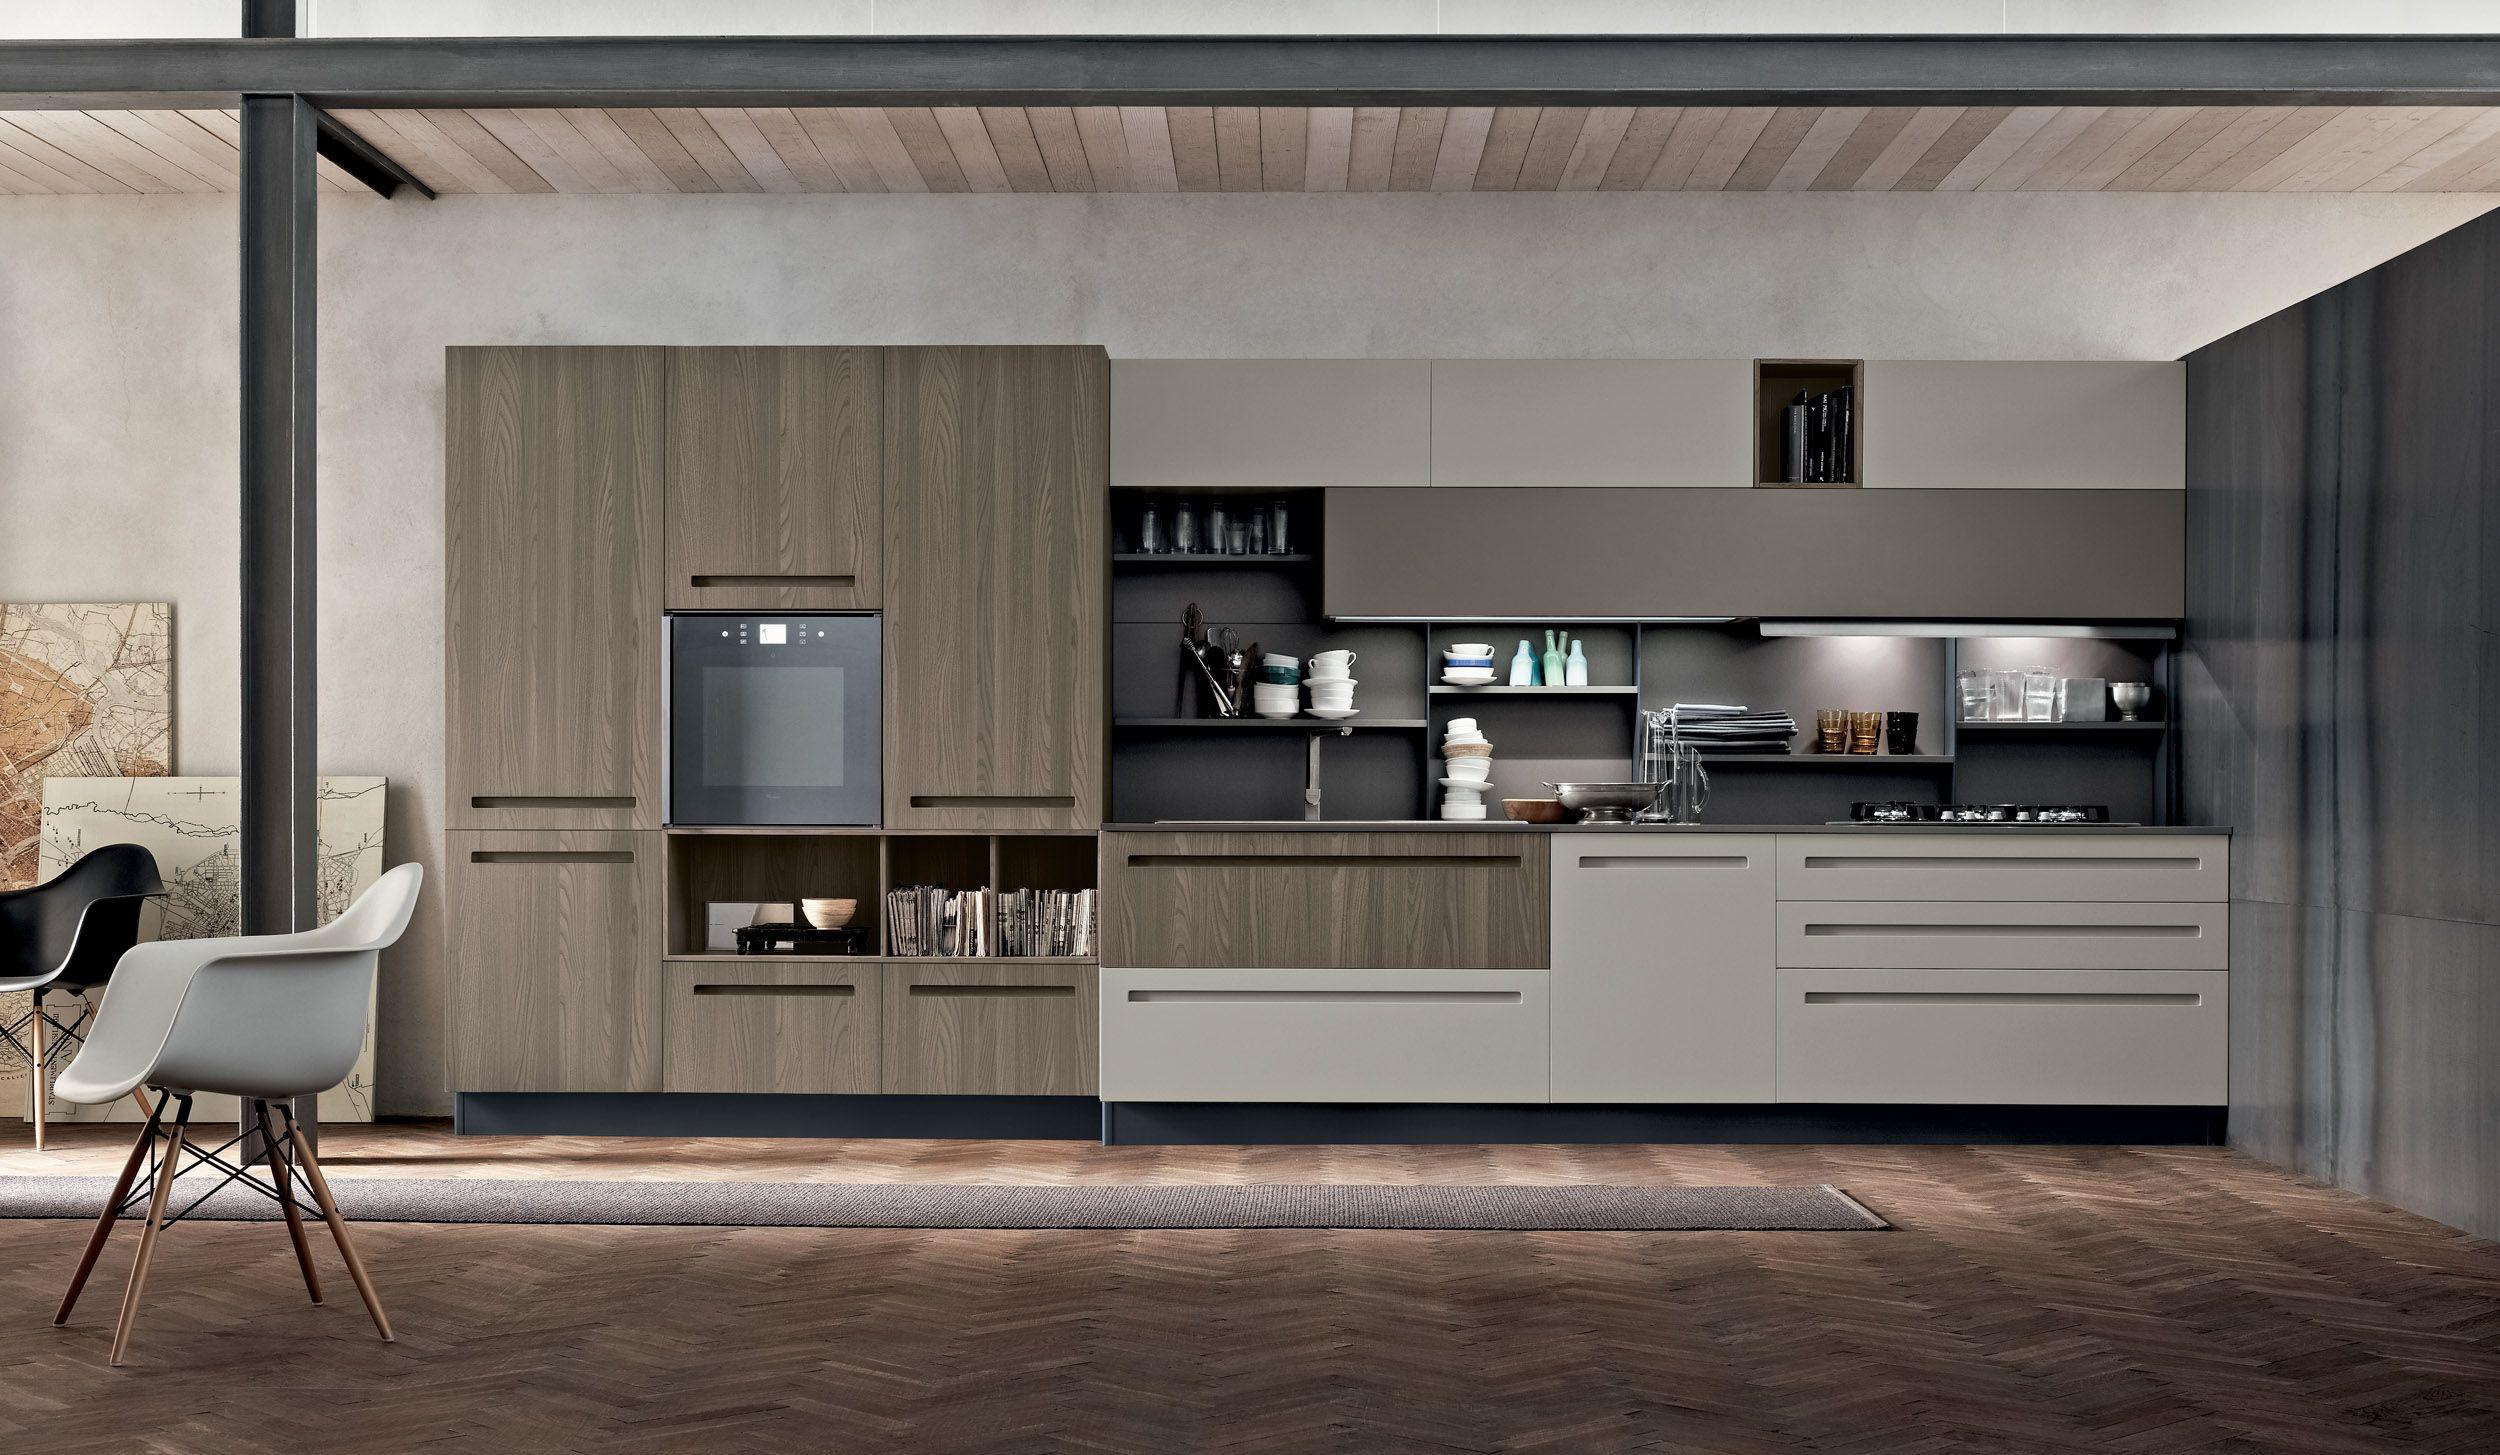 Stosa Cucine: arredamento per cucine moderne Mood | kitchen ...